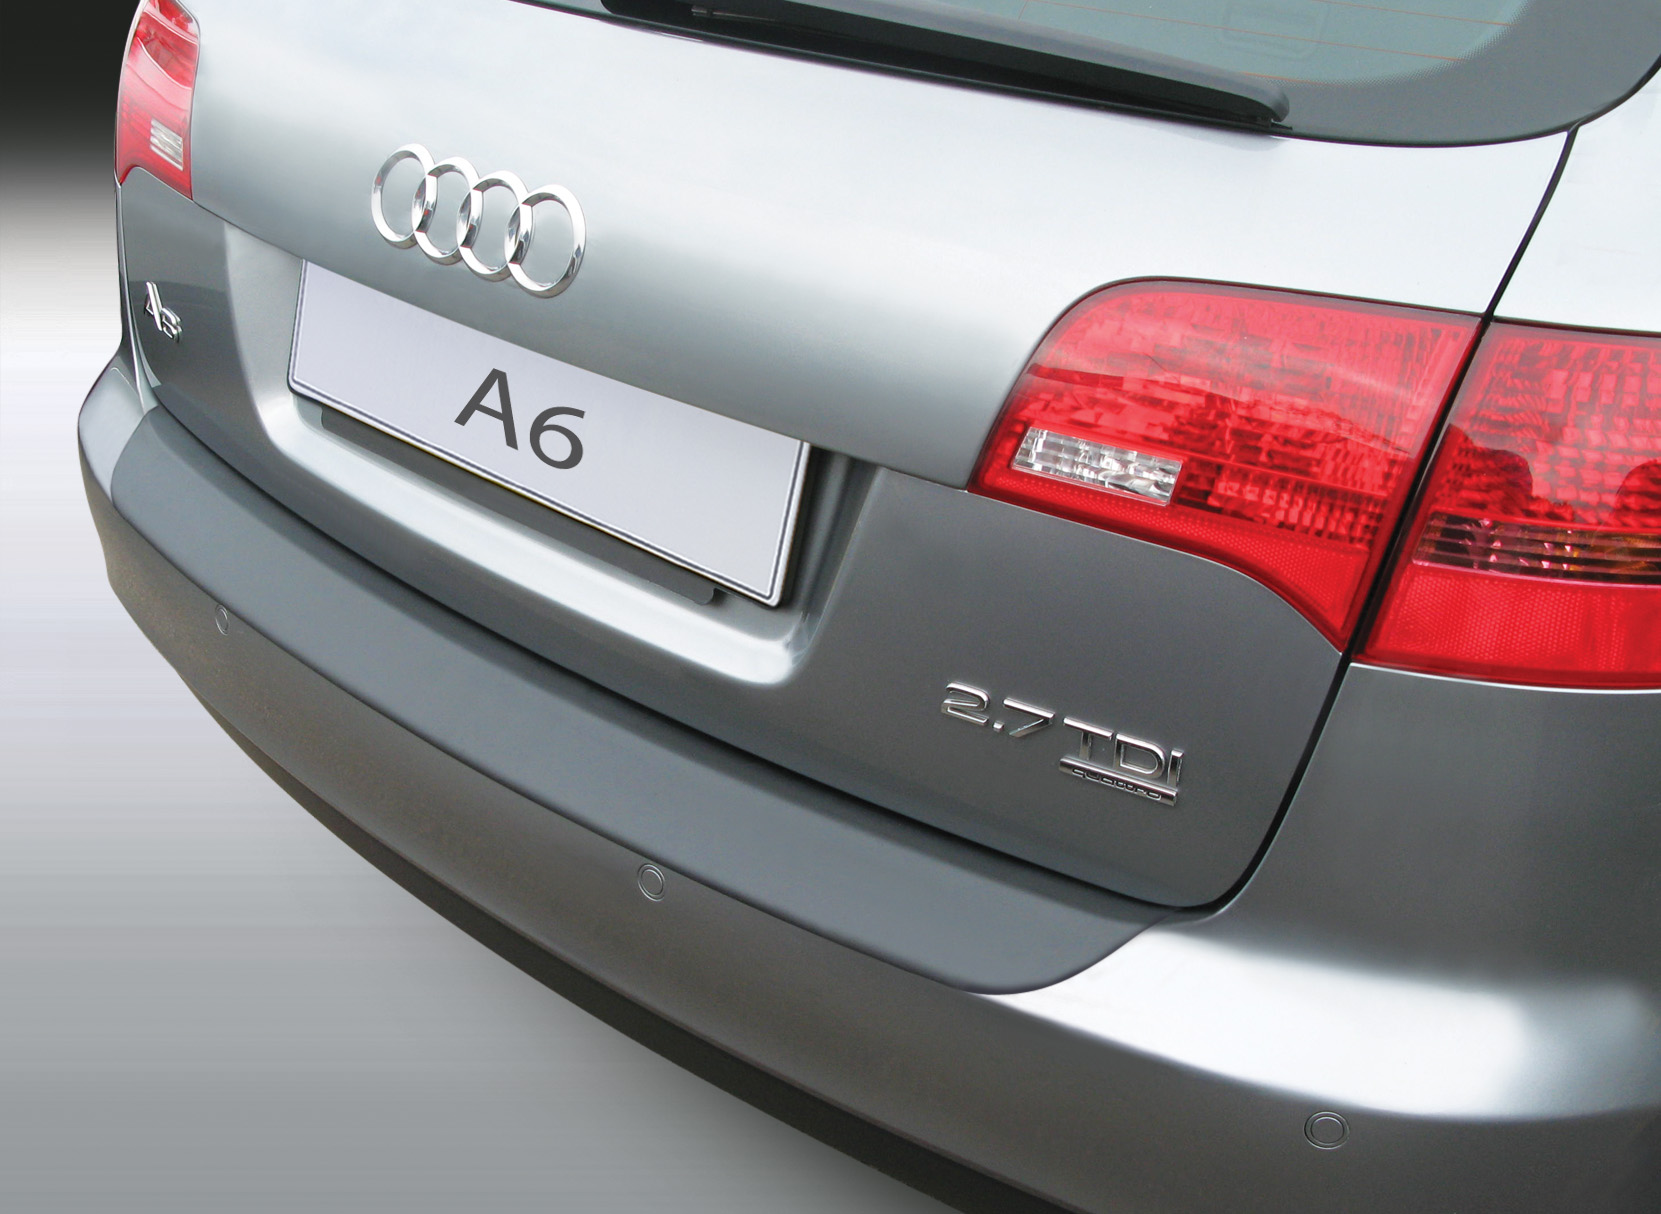 Накладка на задний бампер Audi A6 Avant, Ауди А6, 2004-2011